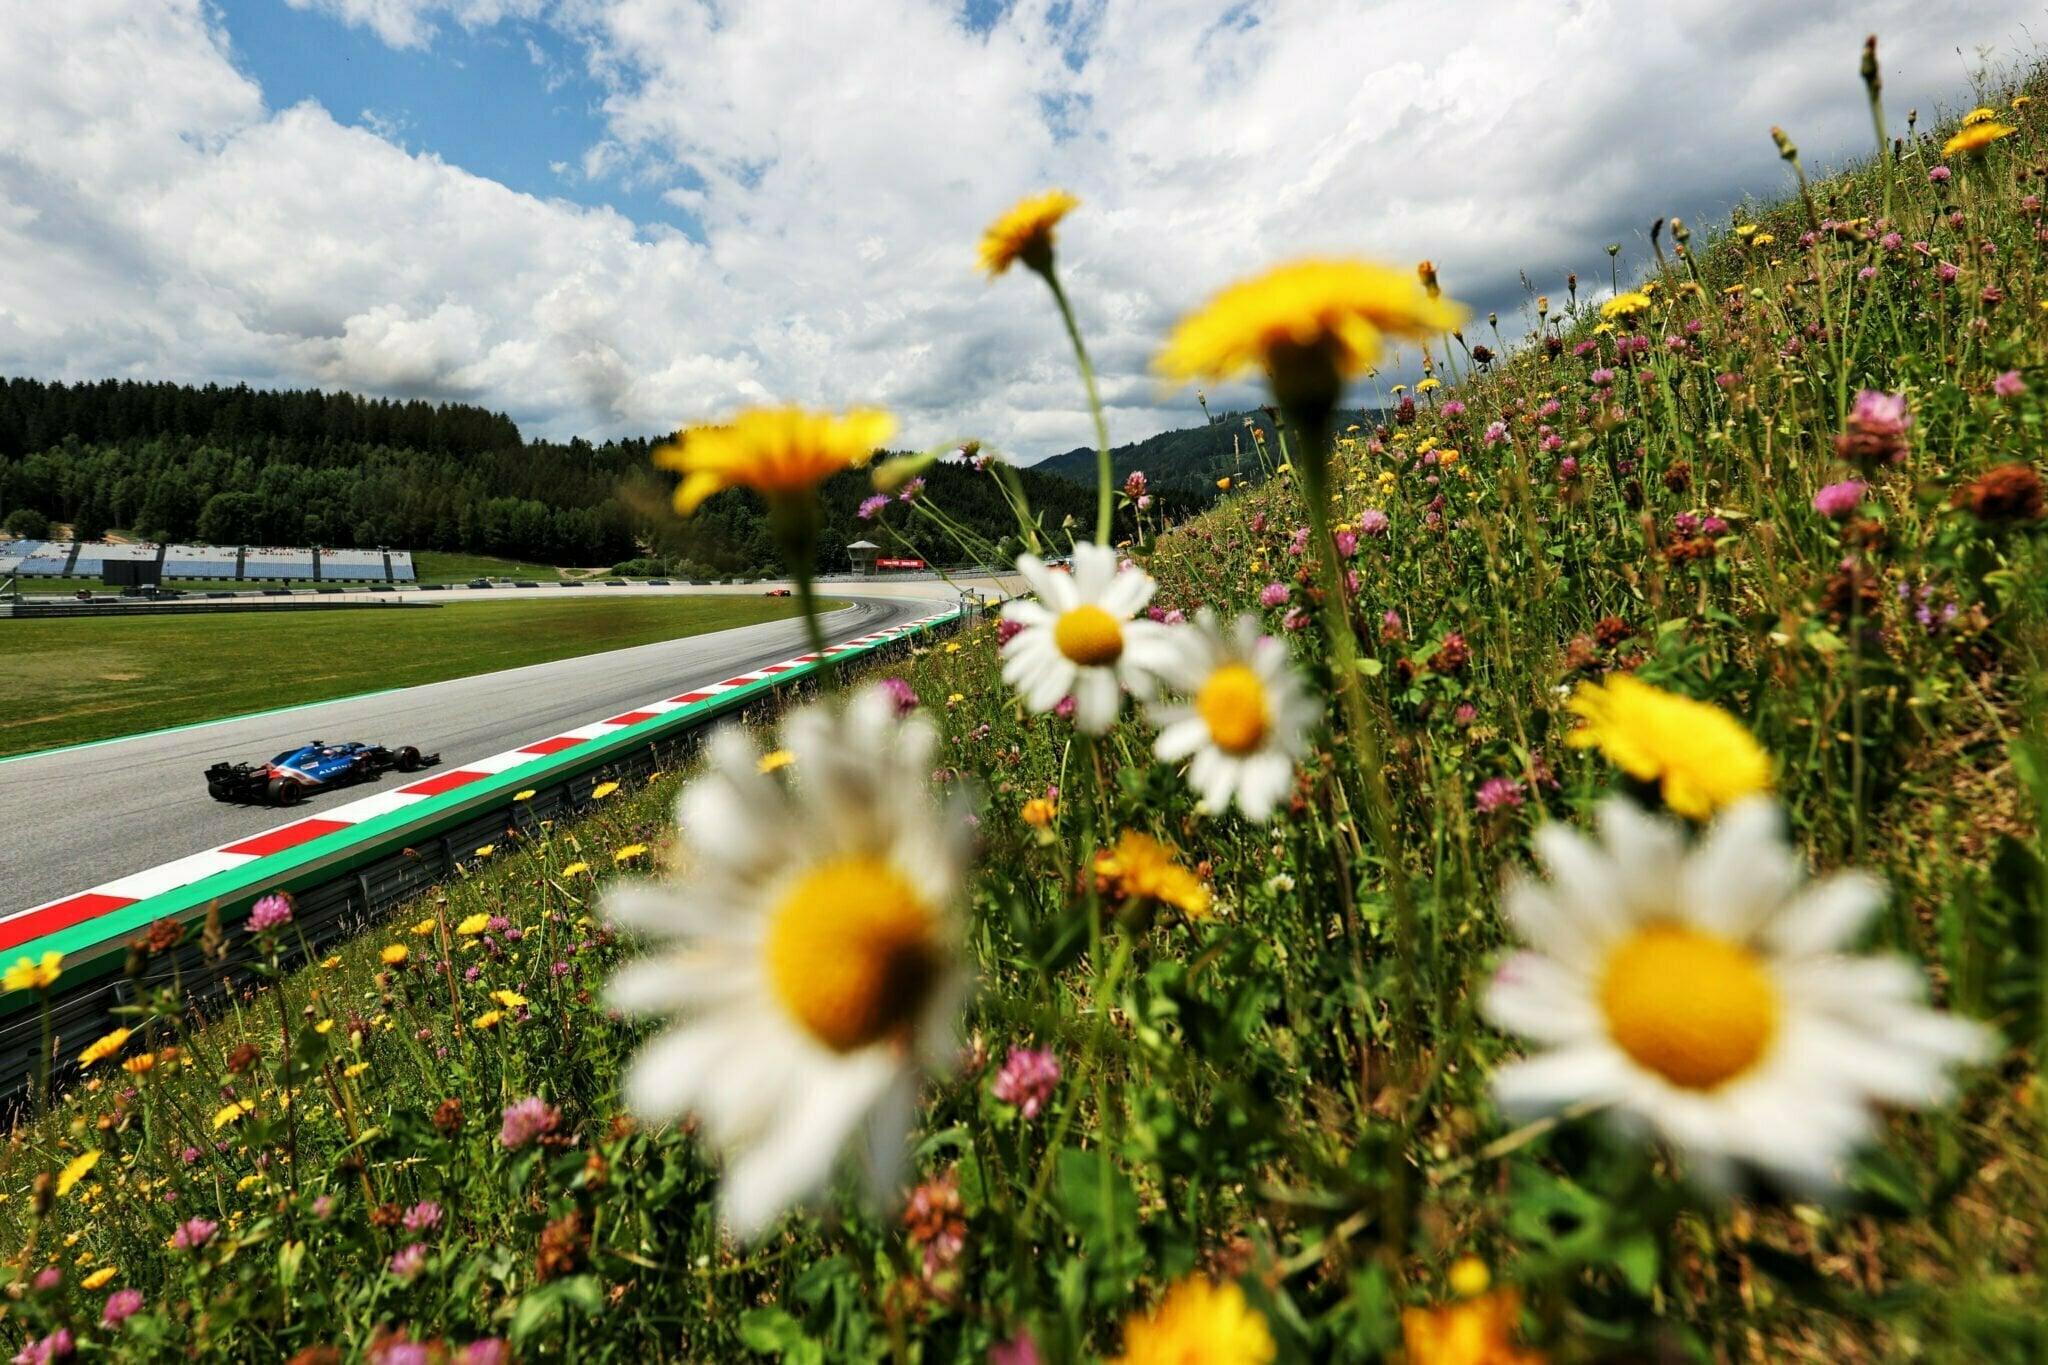 Alpine F1 Team Alonso Ocon Autriche Steiermark Grand Prix Spielberg A521 2021 19 | Alpine F1 : Alonso rapporte deux points au Grand Prix BWT de Styrie